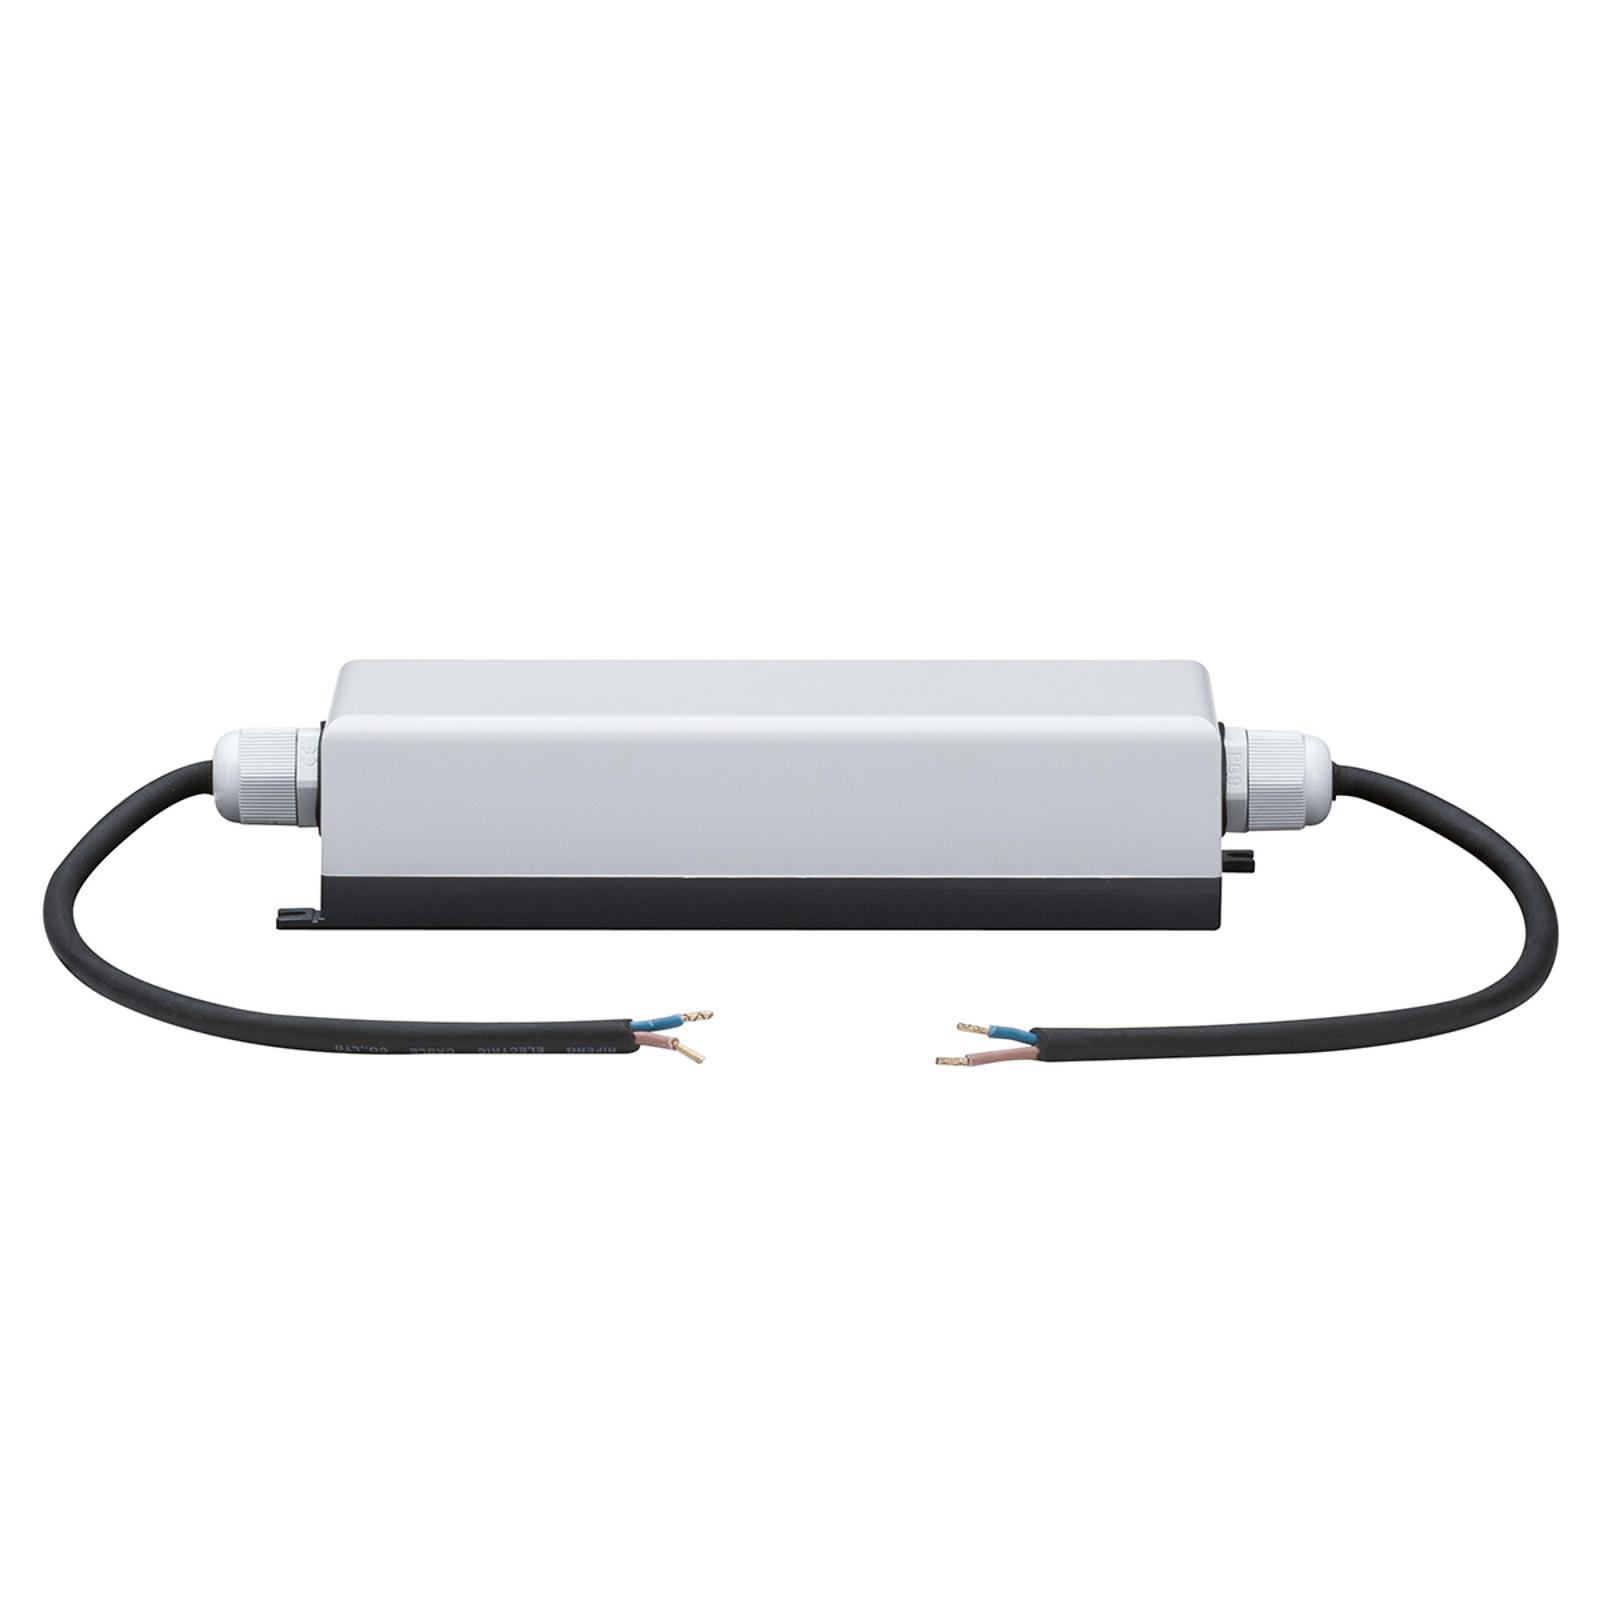 LED driver 60 W for LED stripe Your LED